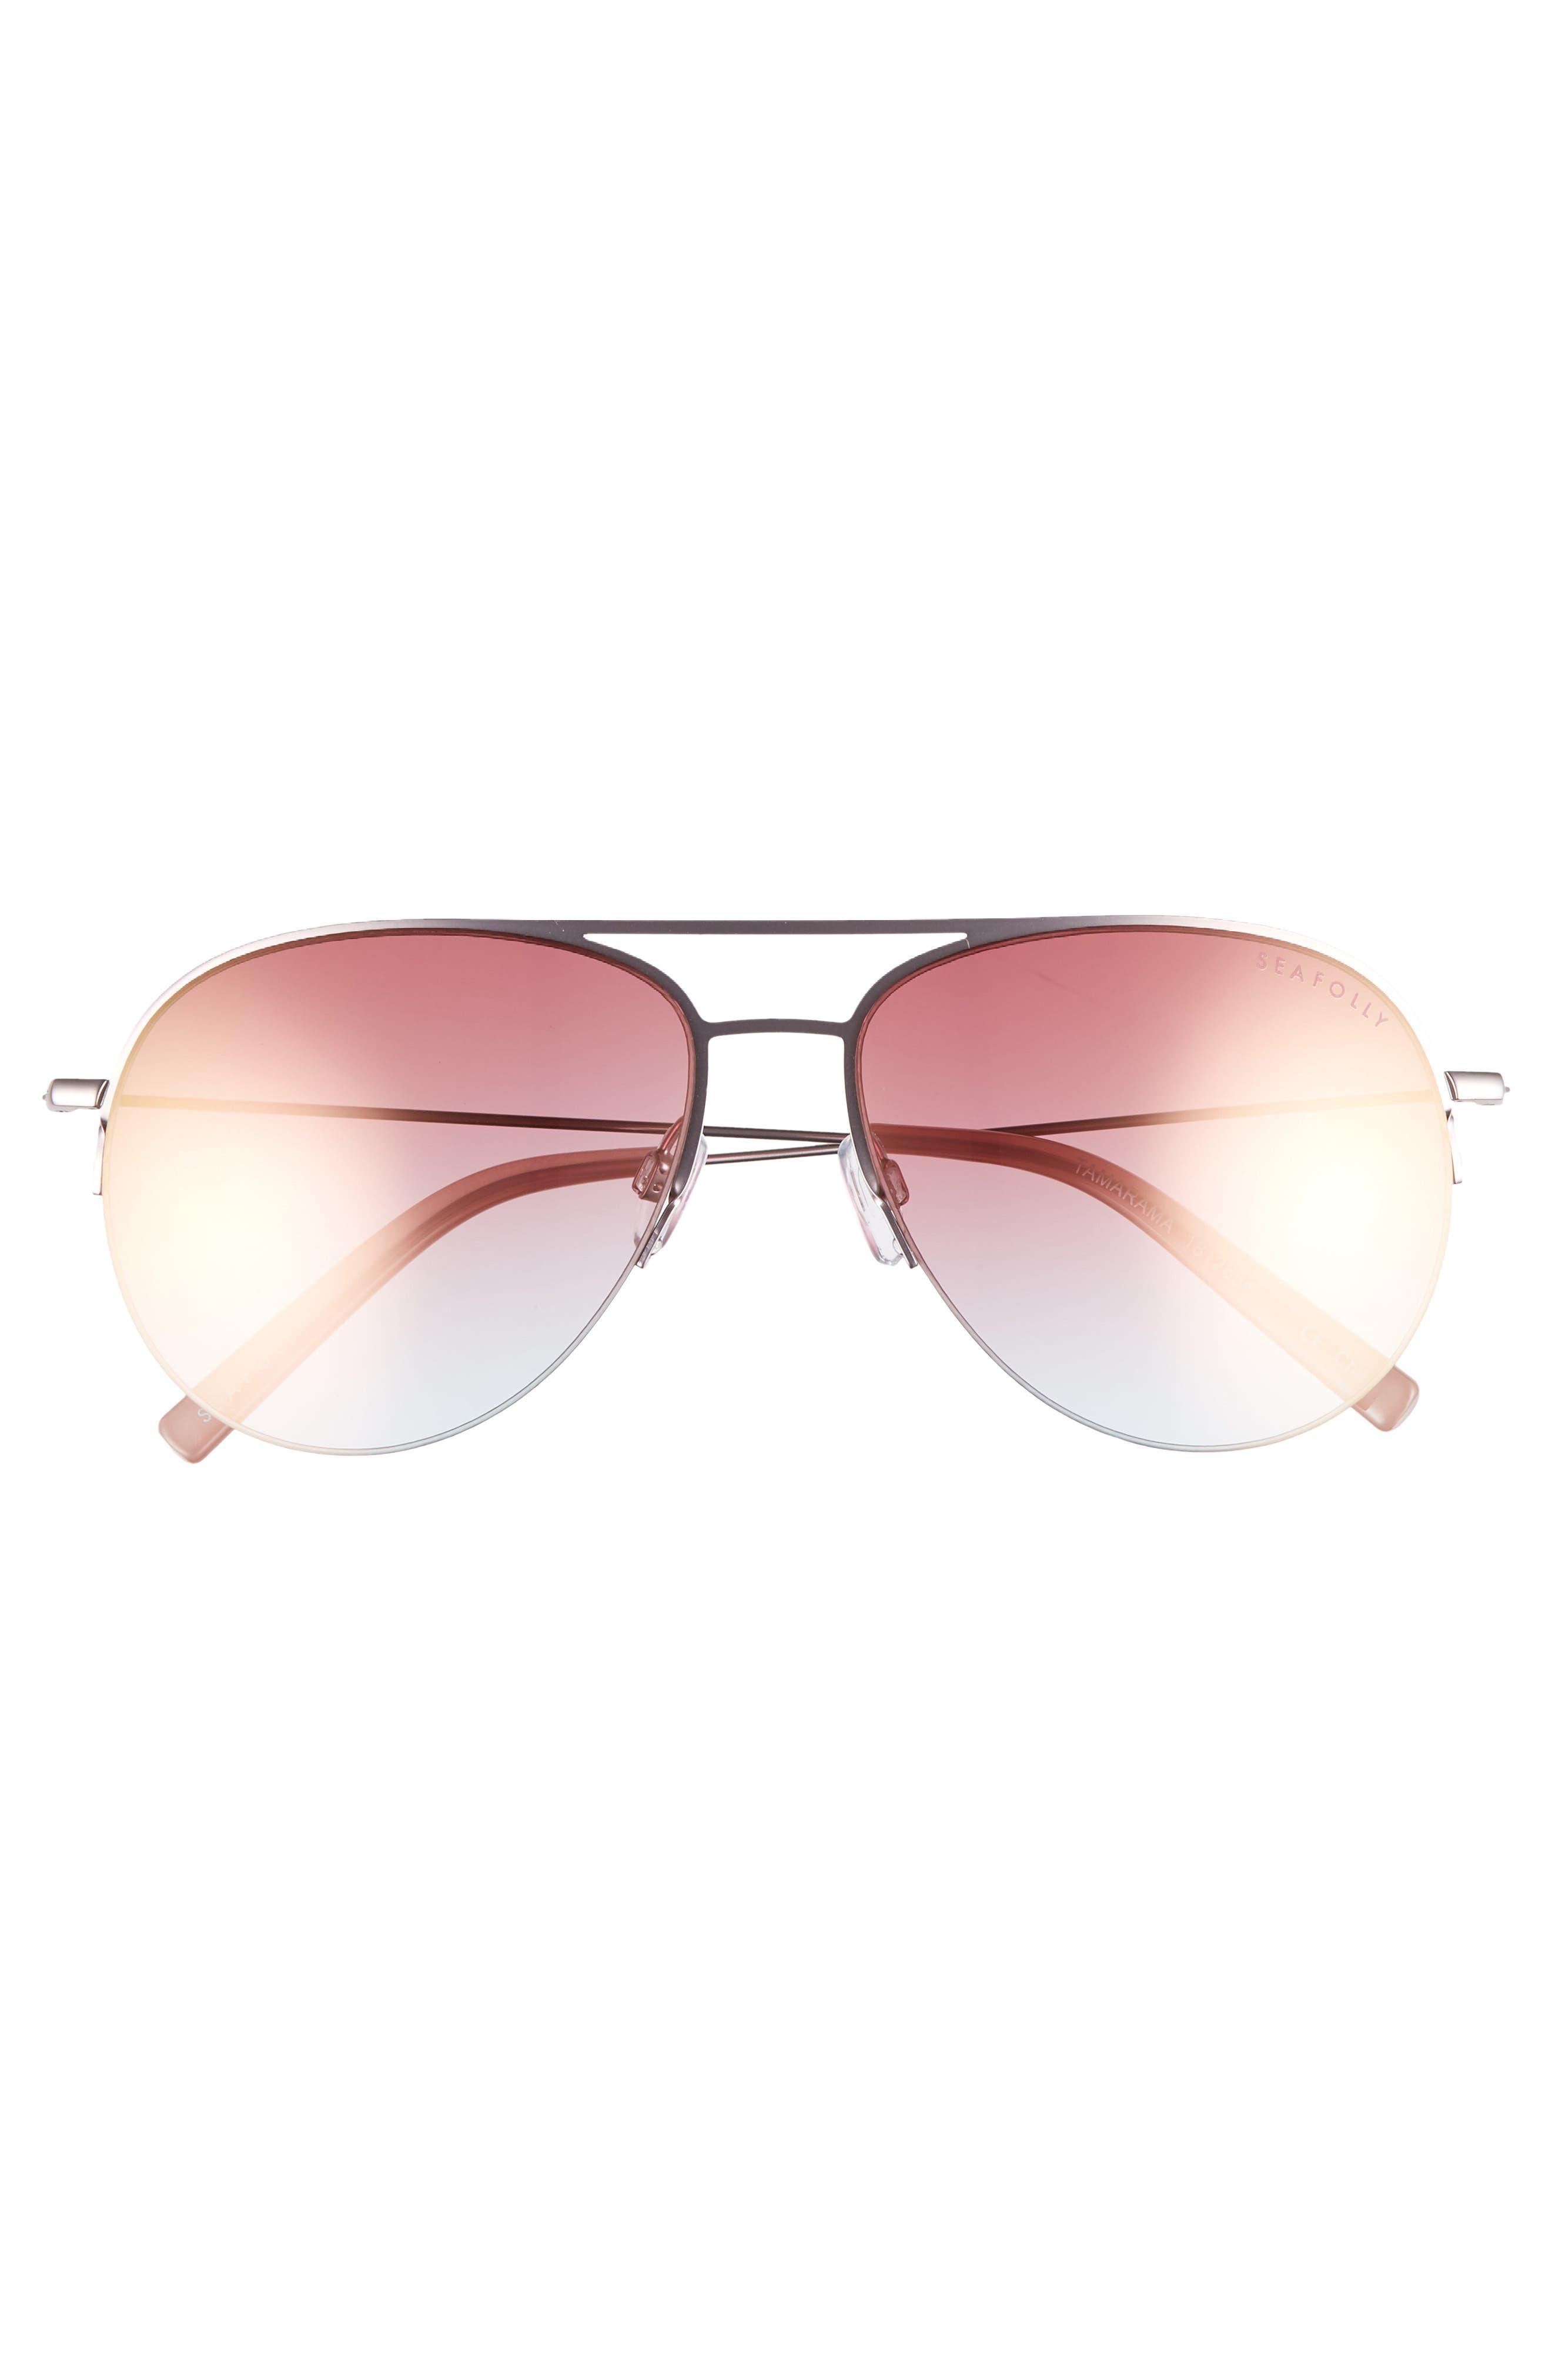 Tamarama 60mm Aviator Sunglasses,                             Alternate thumbnail 3, color,                             612